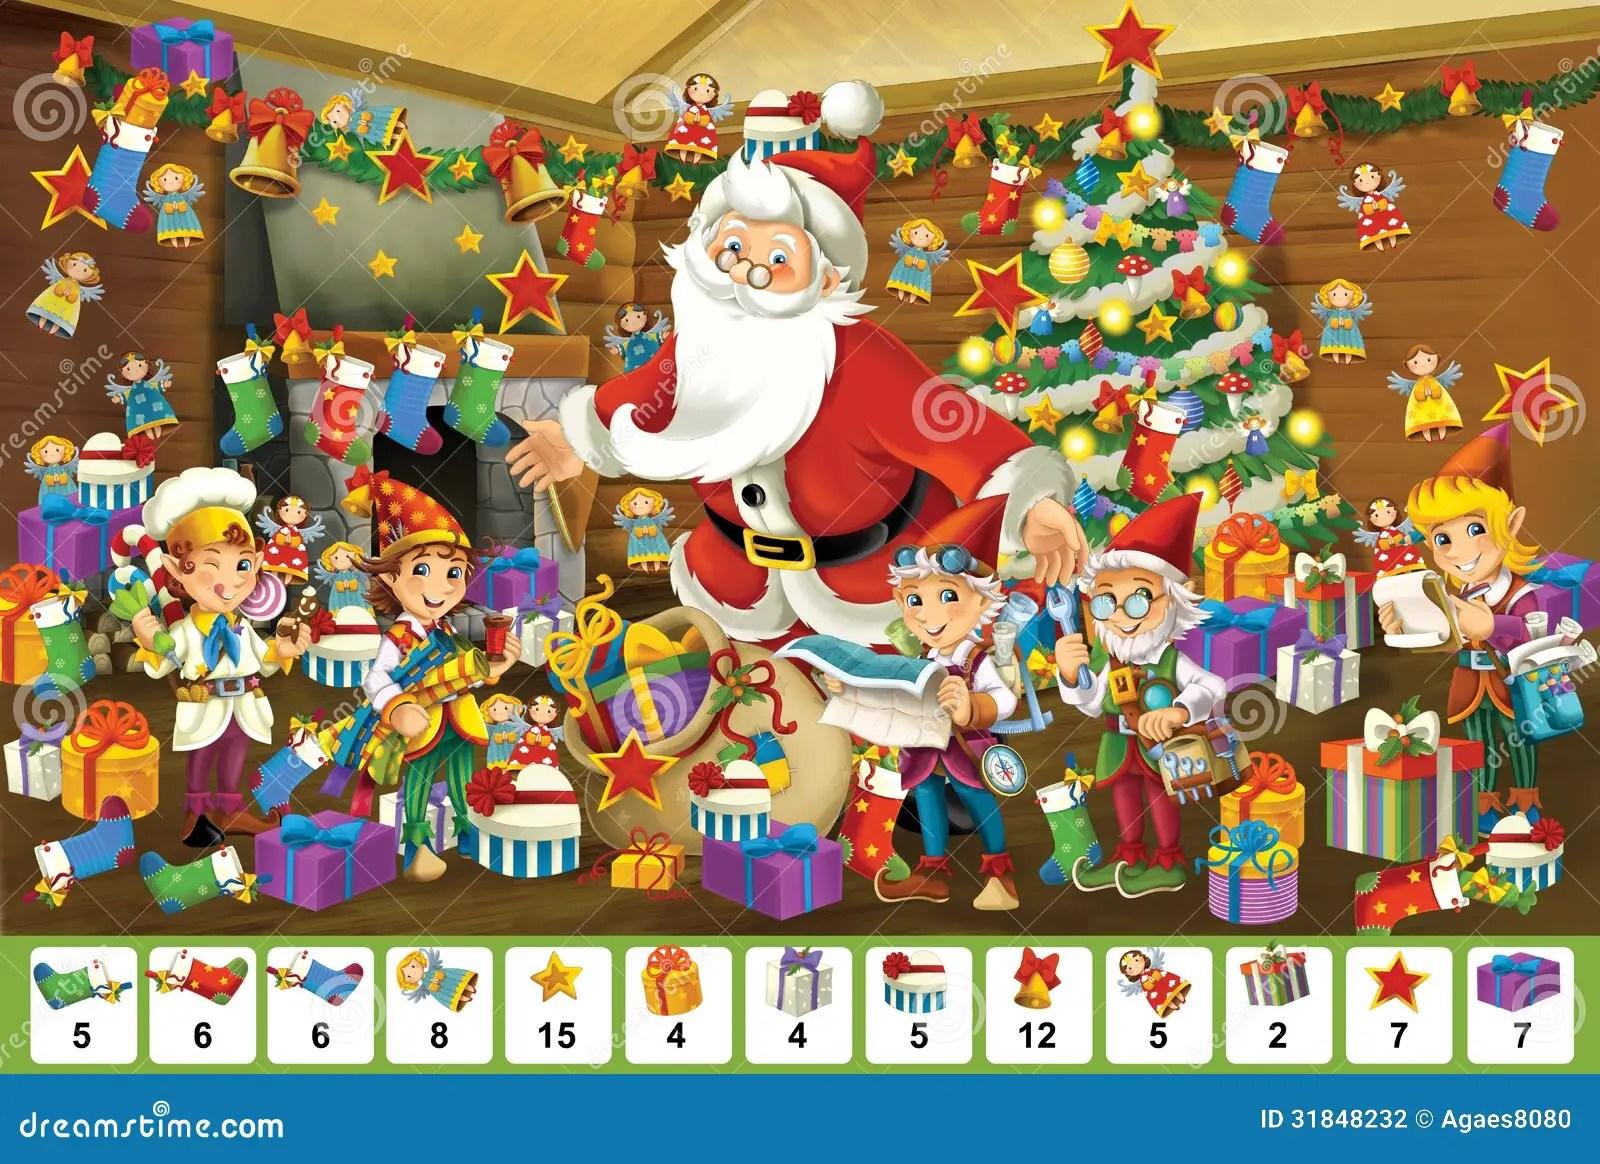 The Christmas Board Game Santa Claus Stock